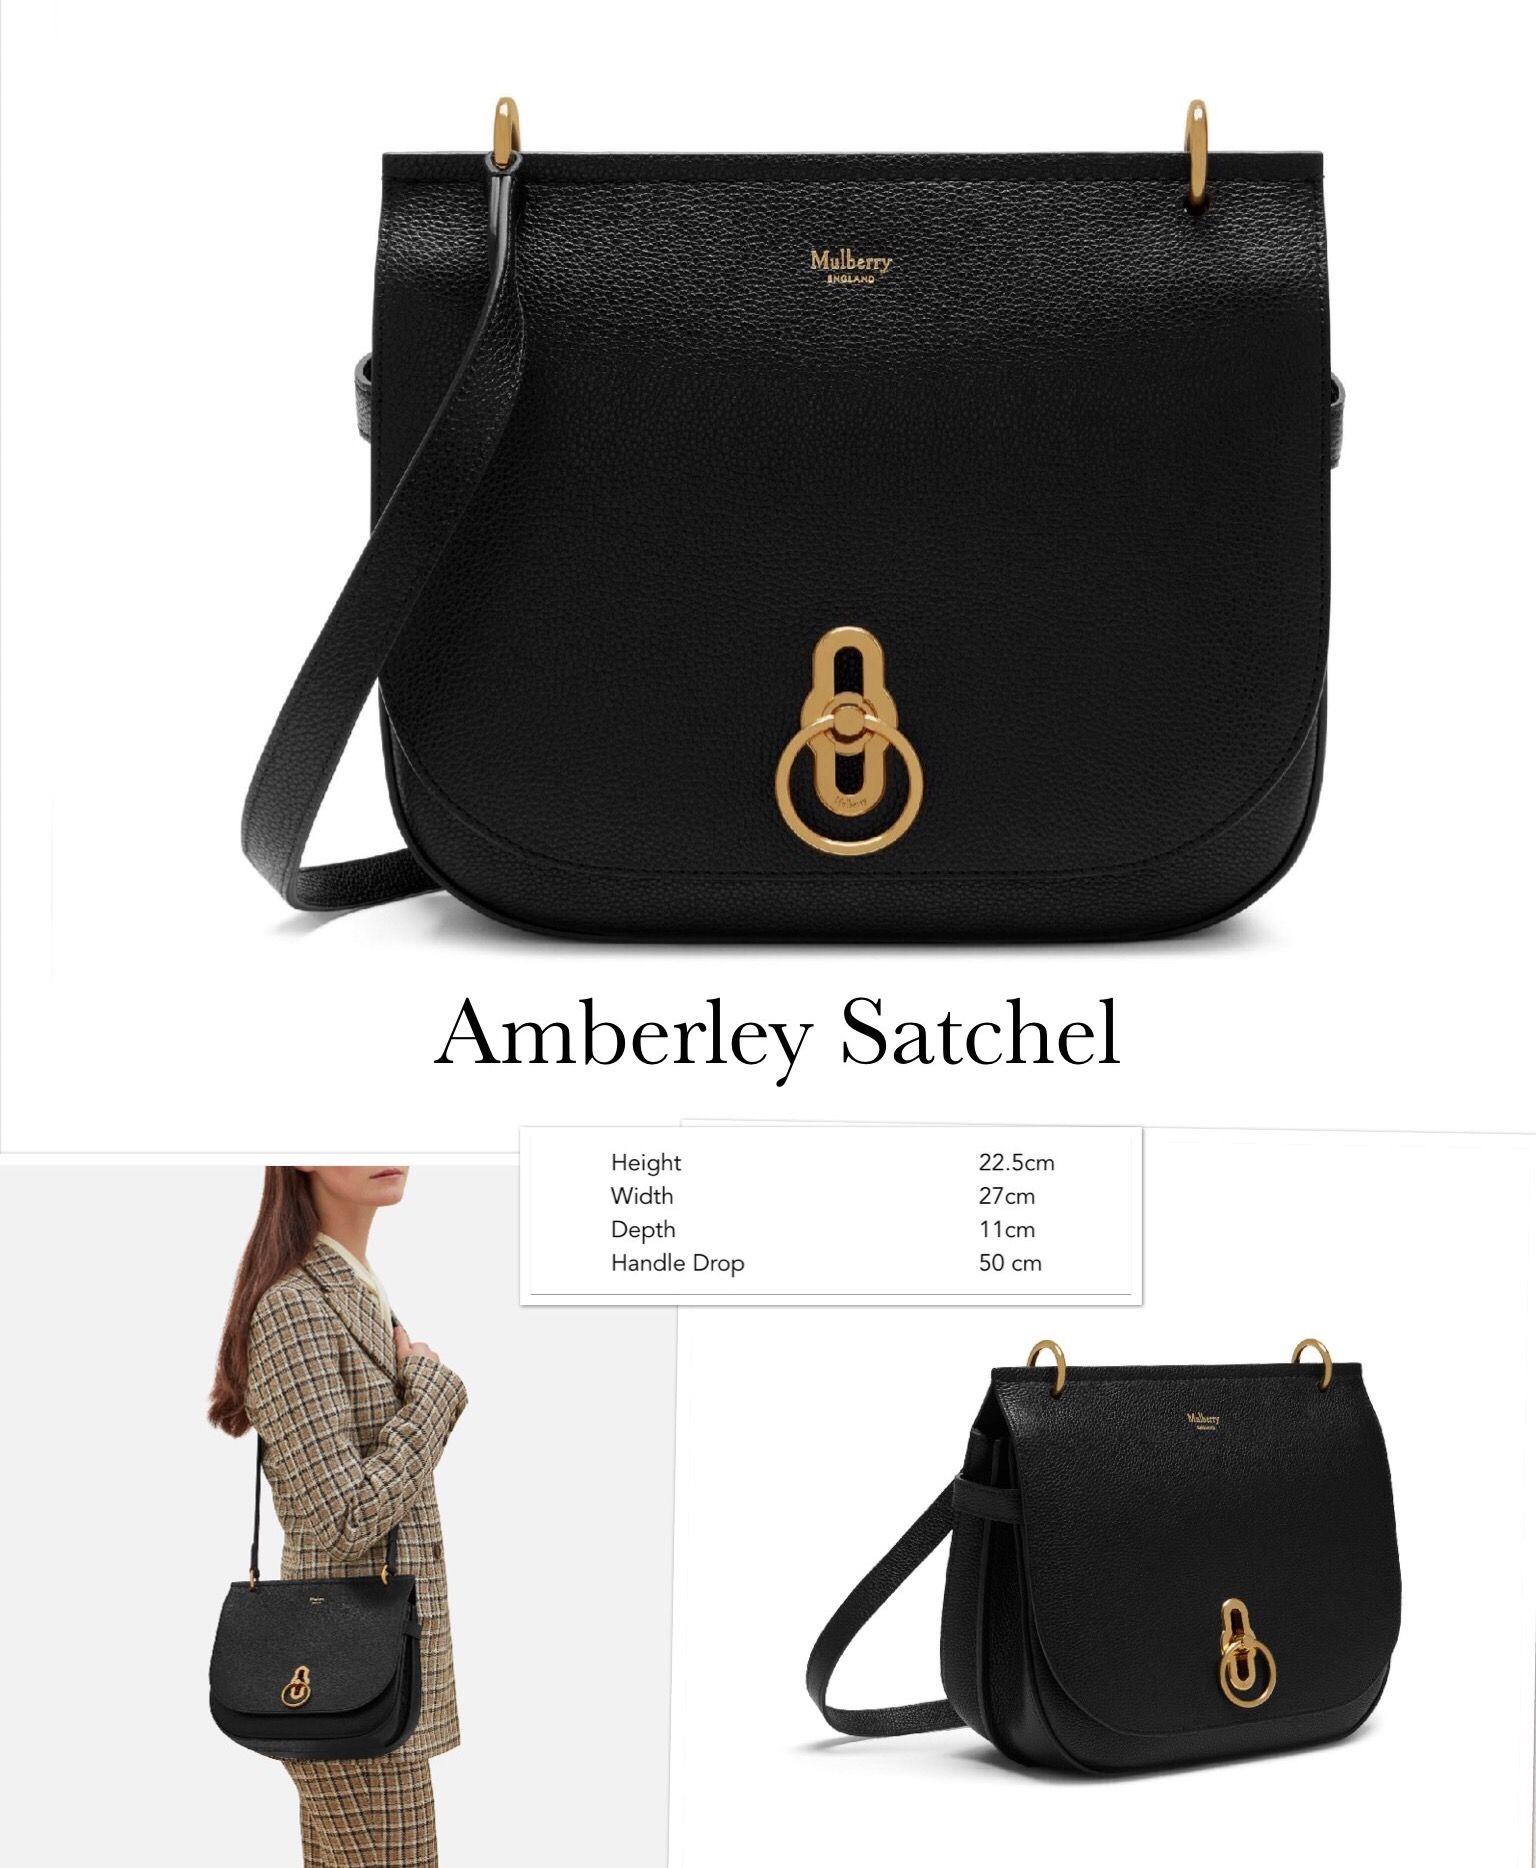 304d1f20664 Mulberry Amberley Satchel FW2017   bag   Bags, Satchel, Handbags